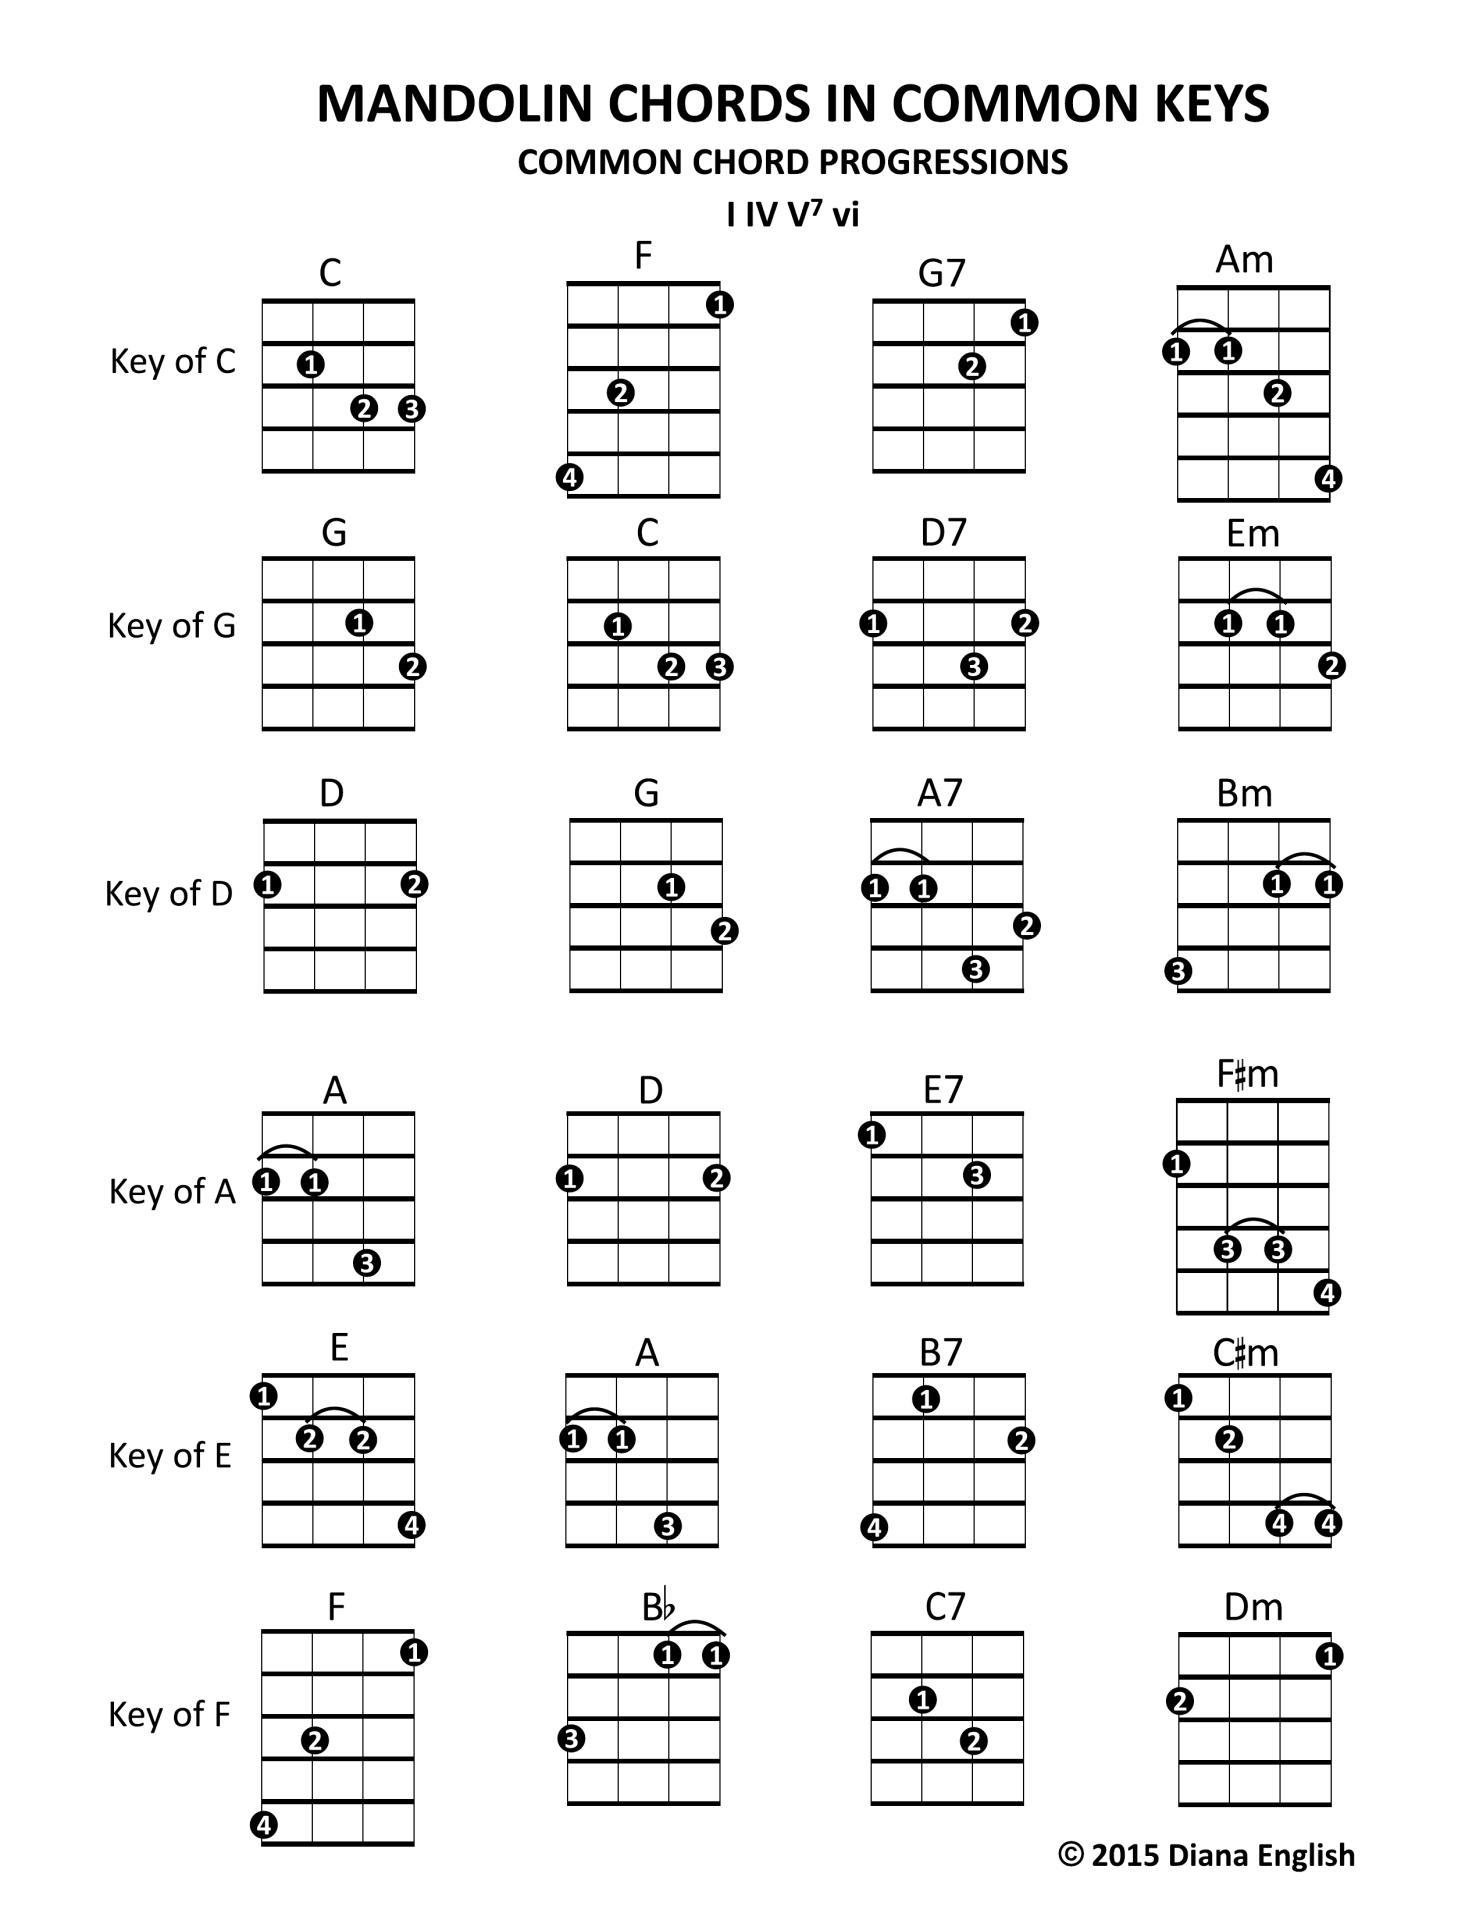 Mandolin Chord Chart Mandolin Chords In Common Keys Common Chord Progressions I Iv V7 Vi